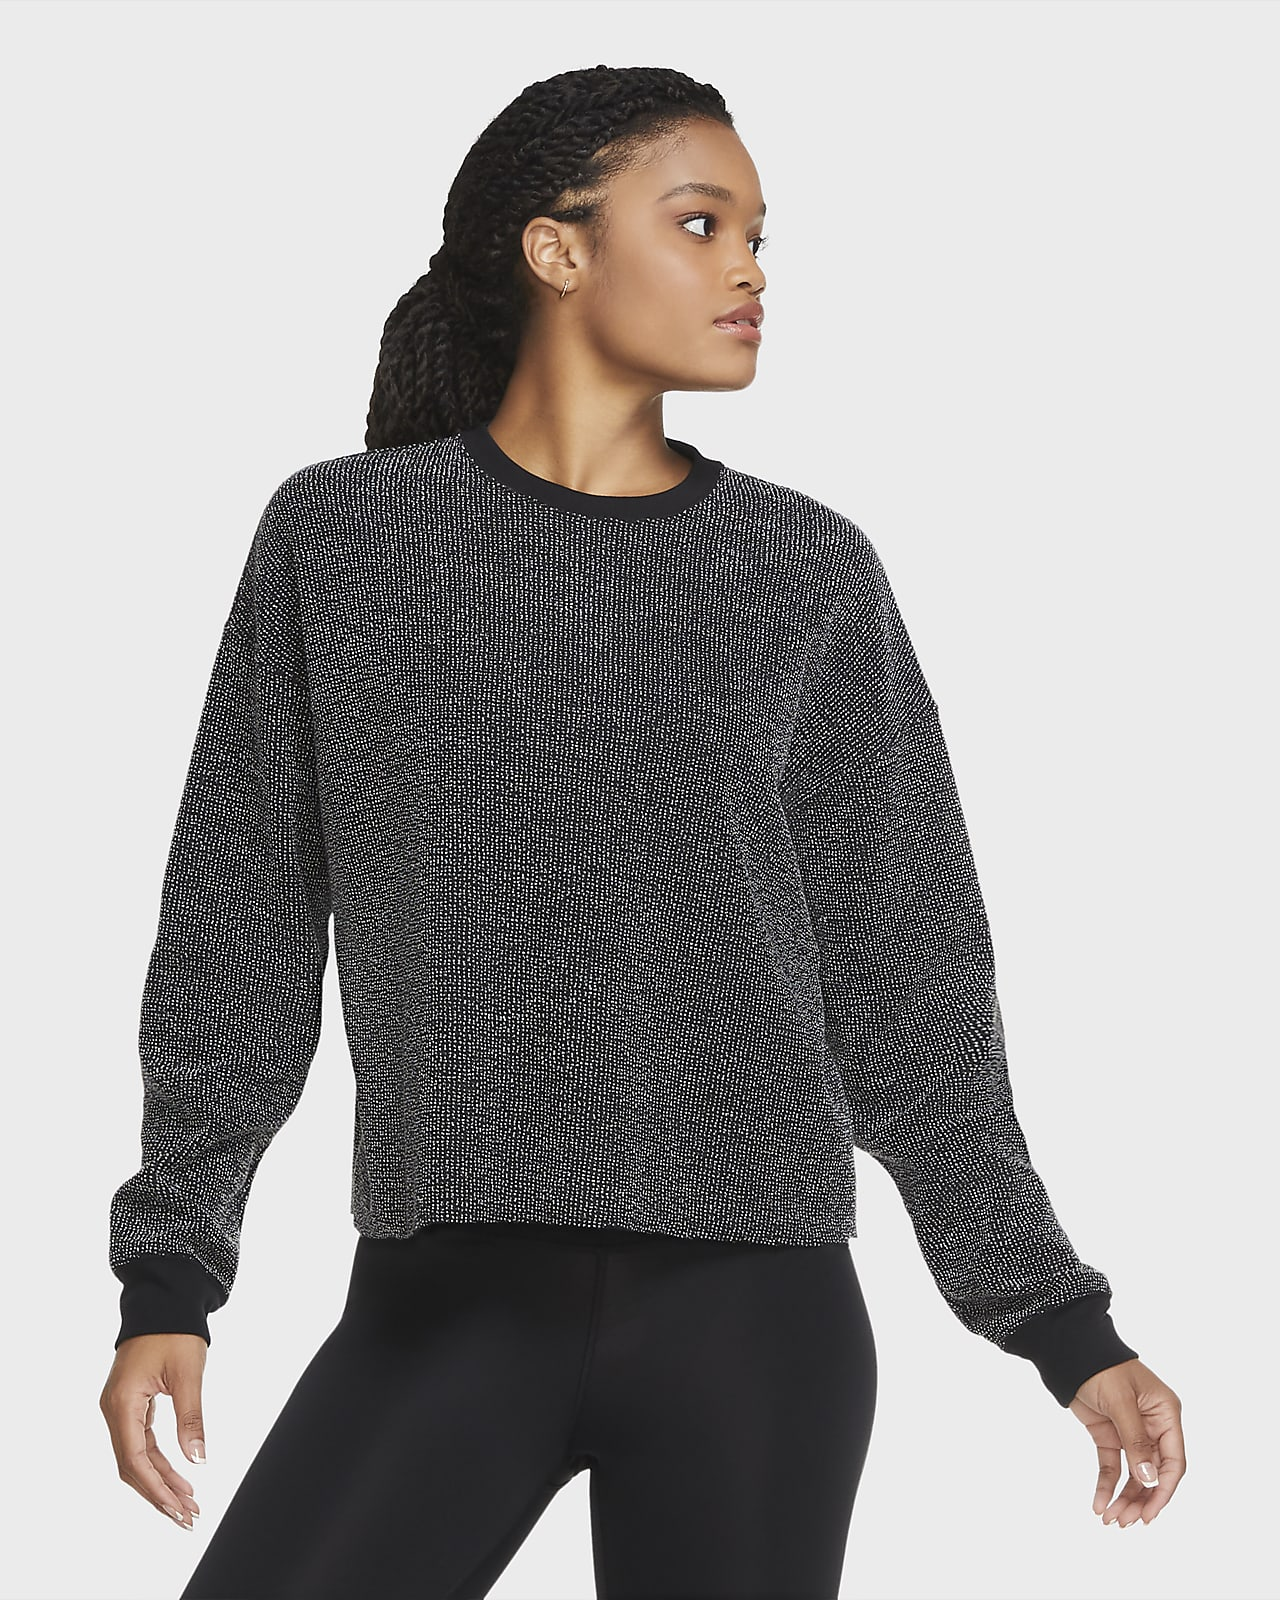 Nike Yoga Women's Crew